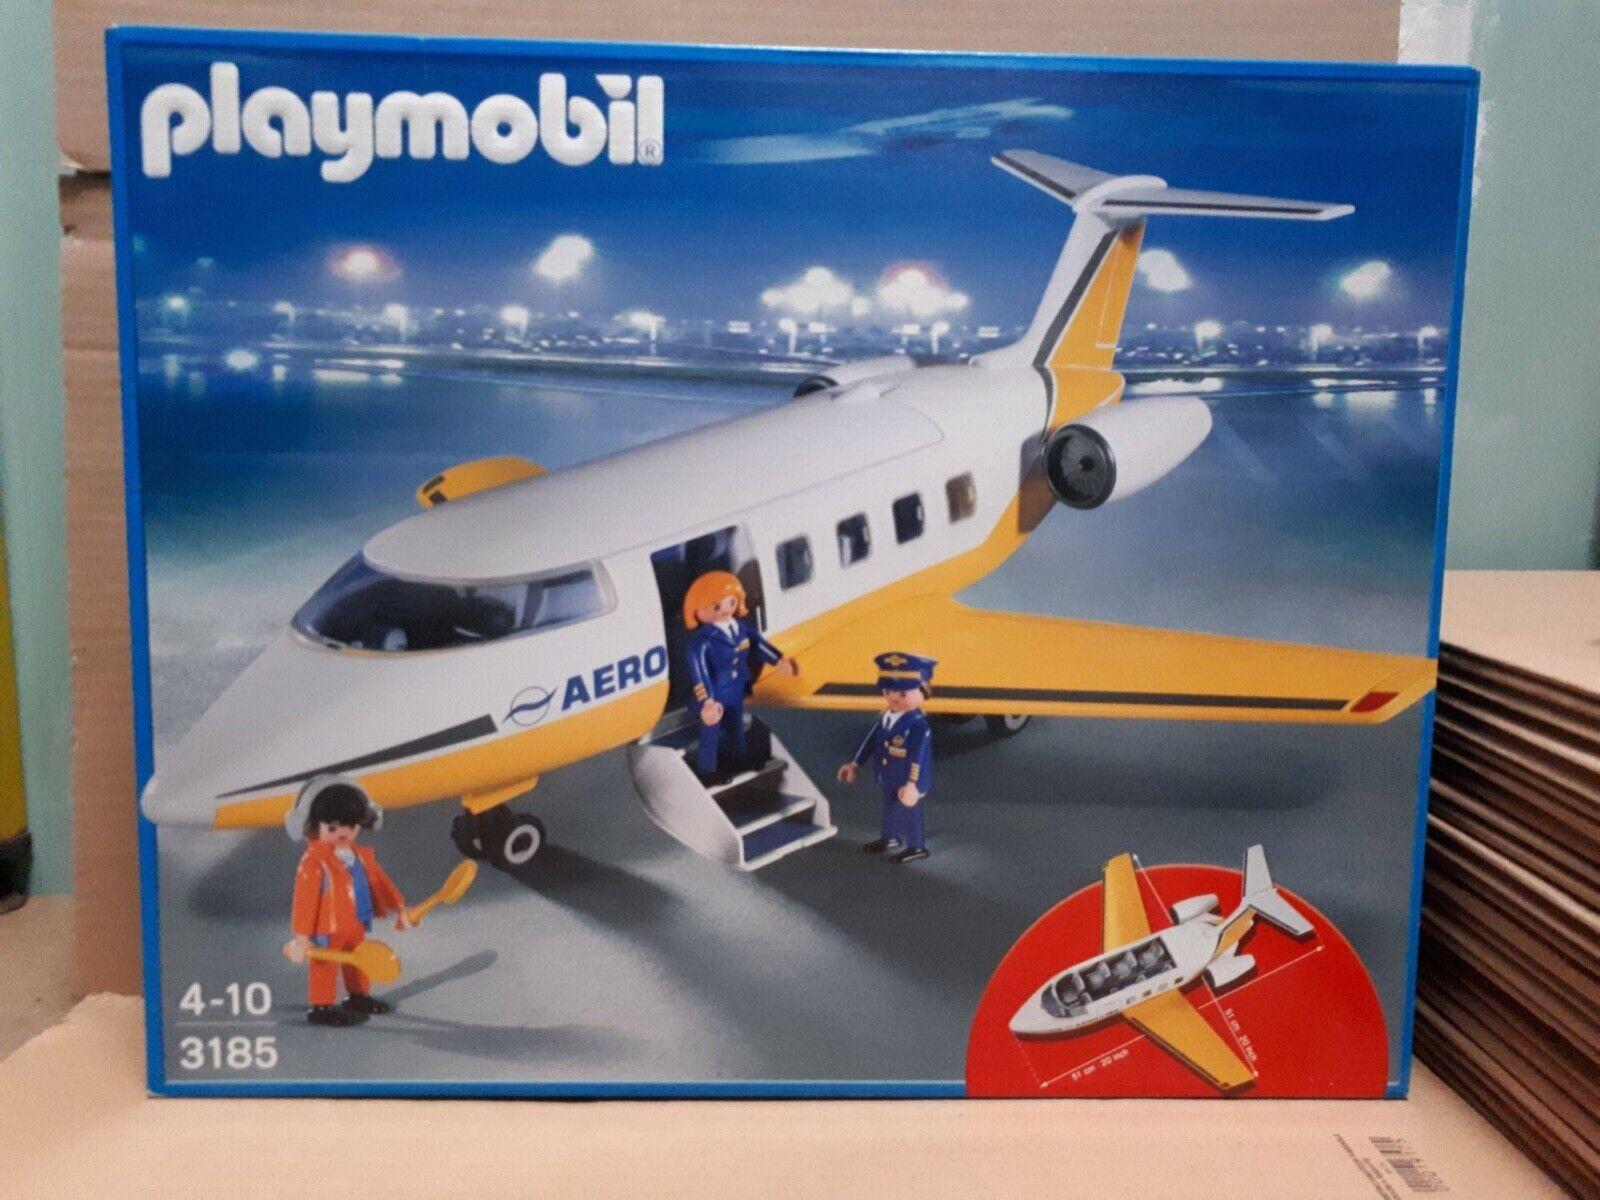 Playmobil 3185 Avion et Equipage NEUF et SCELLE